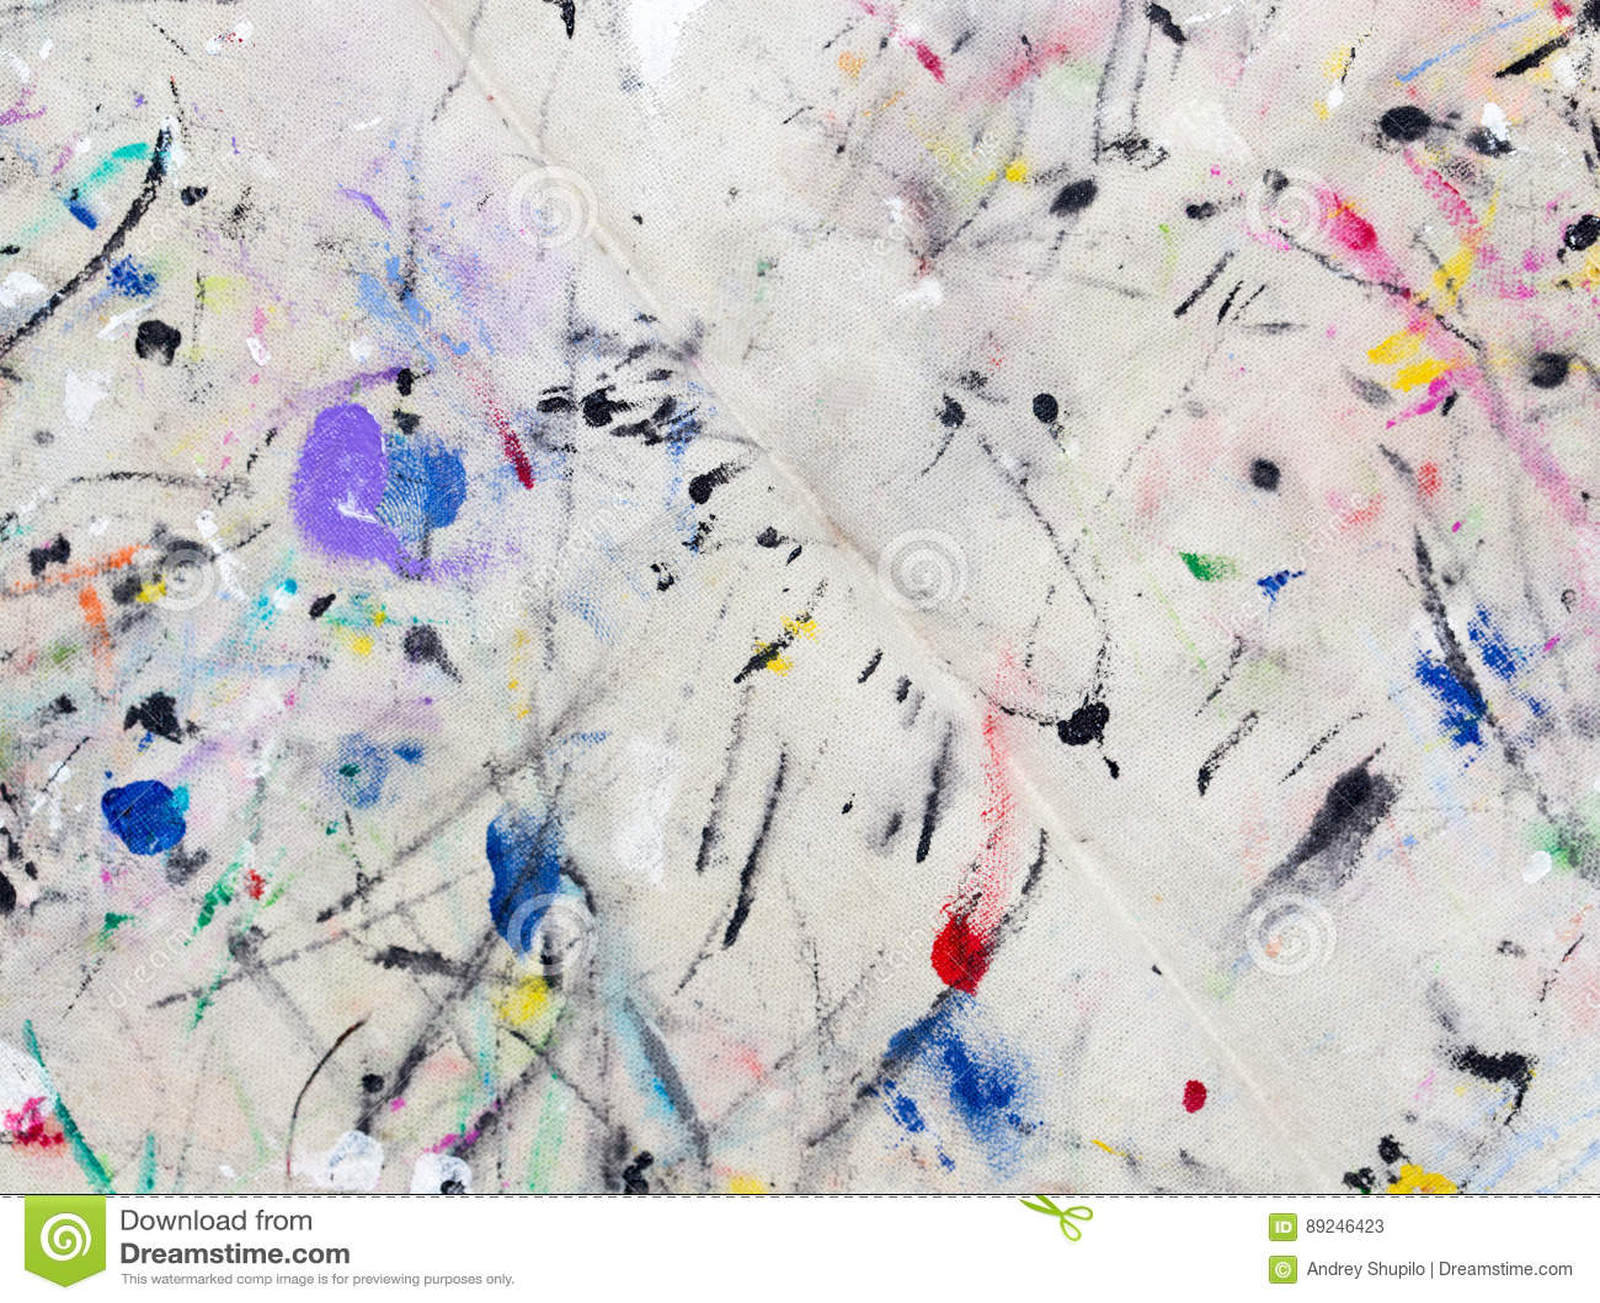 Vlekken van gekleurde verf op stof